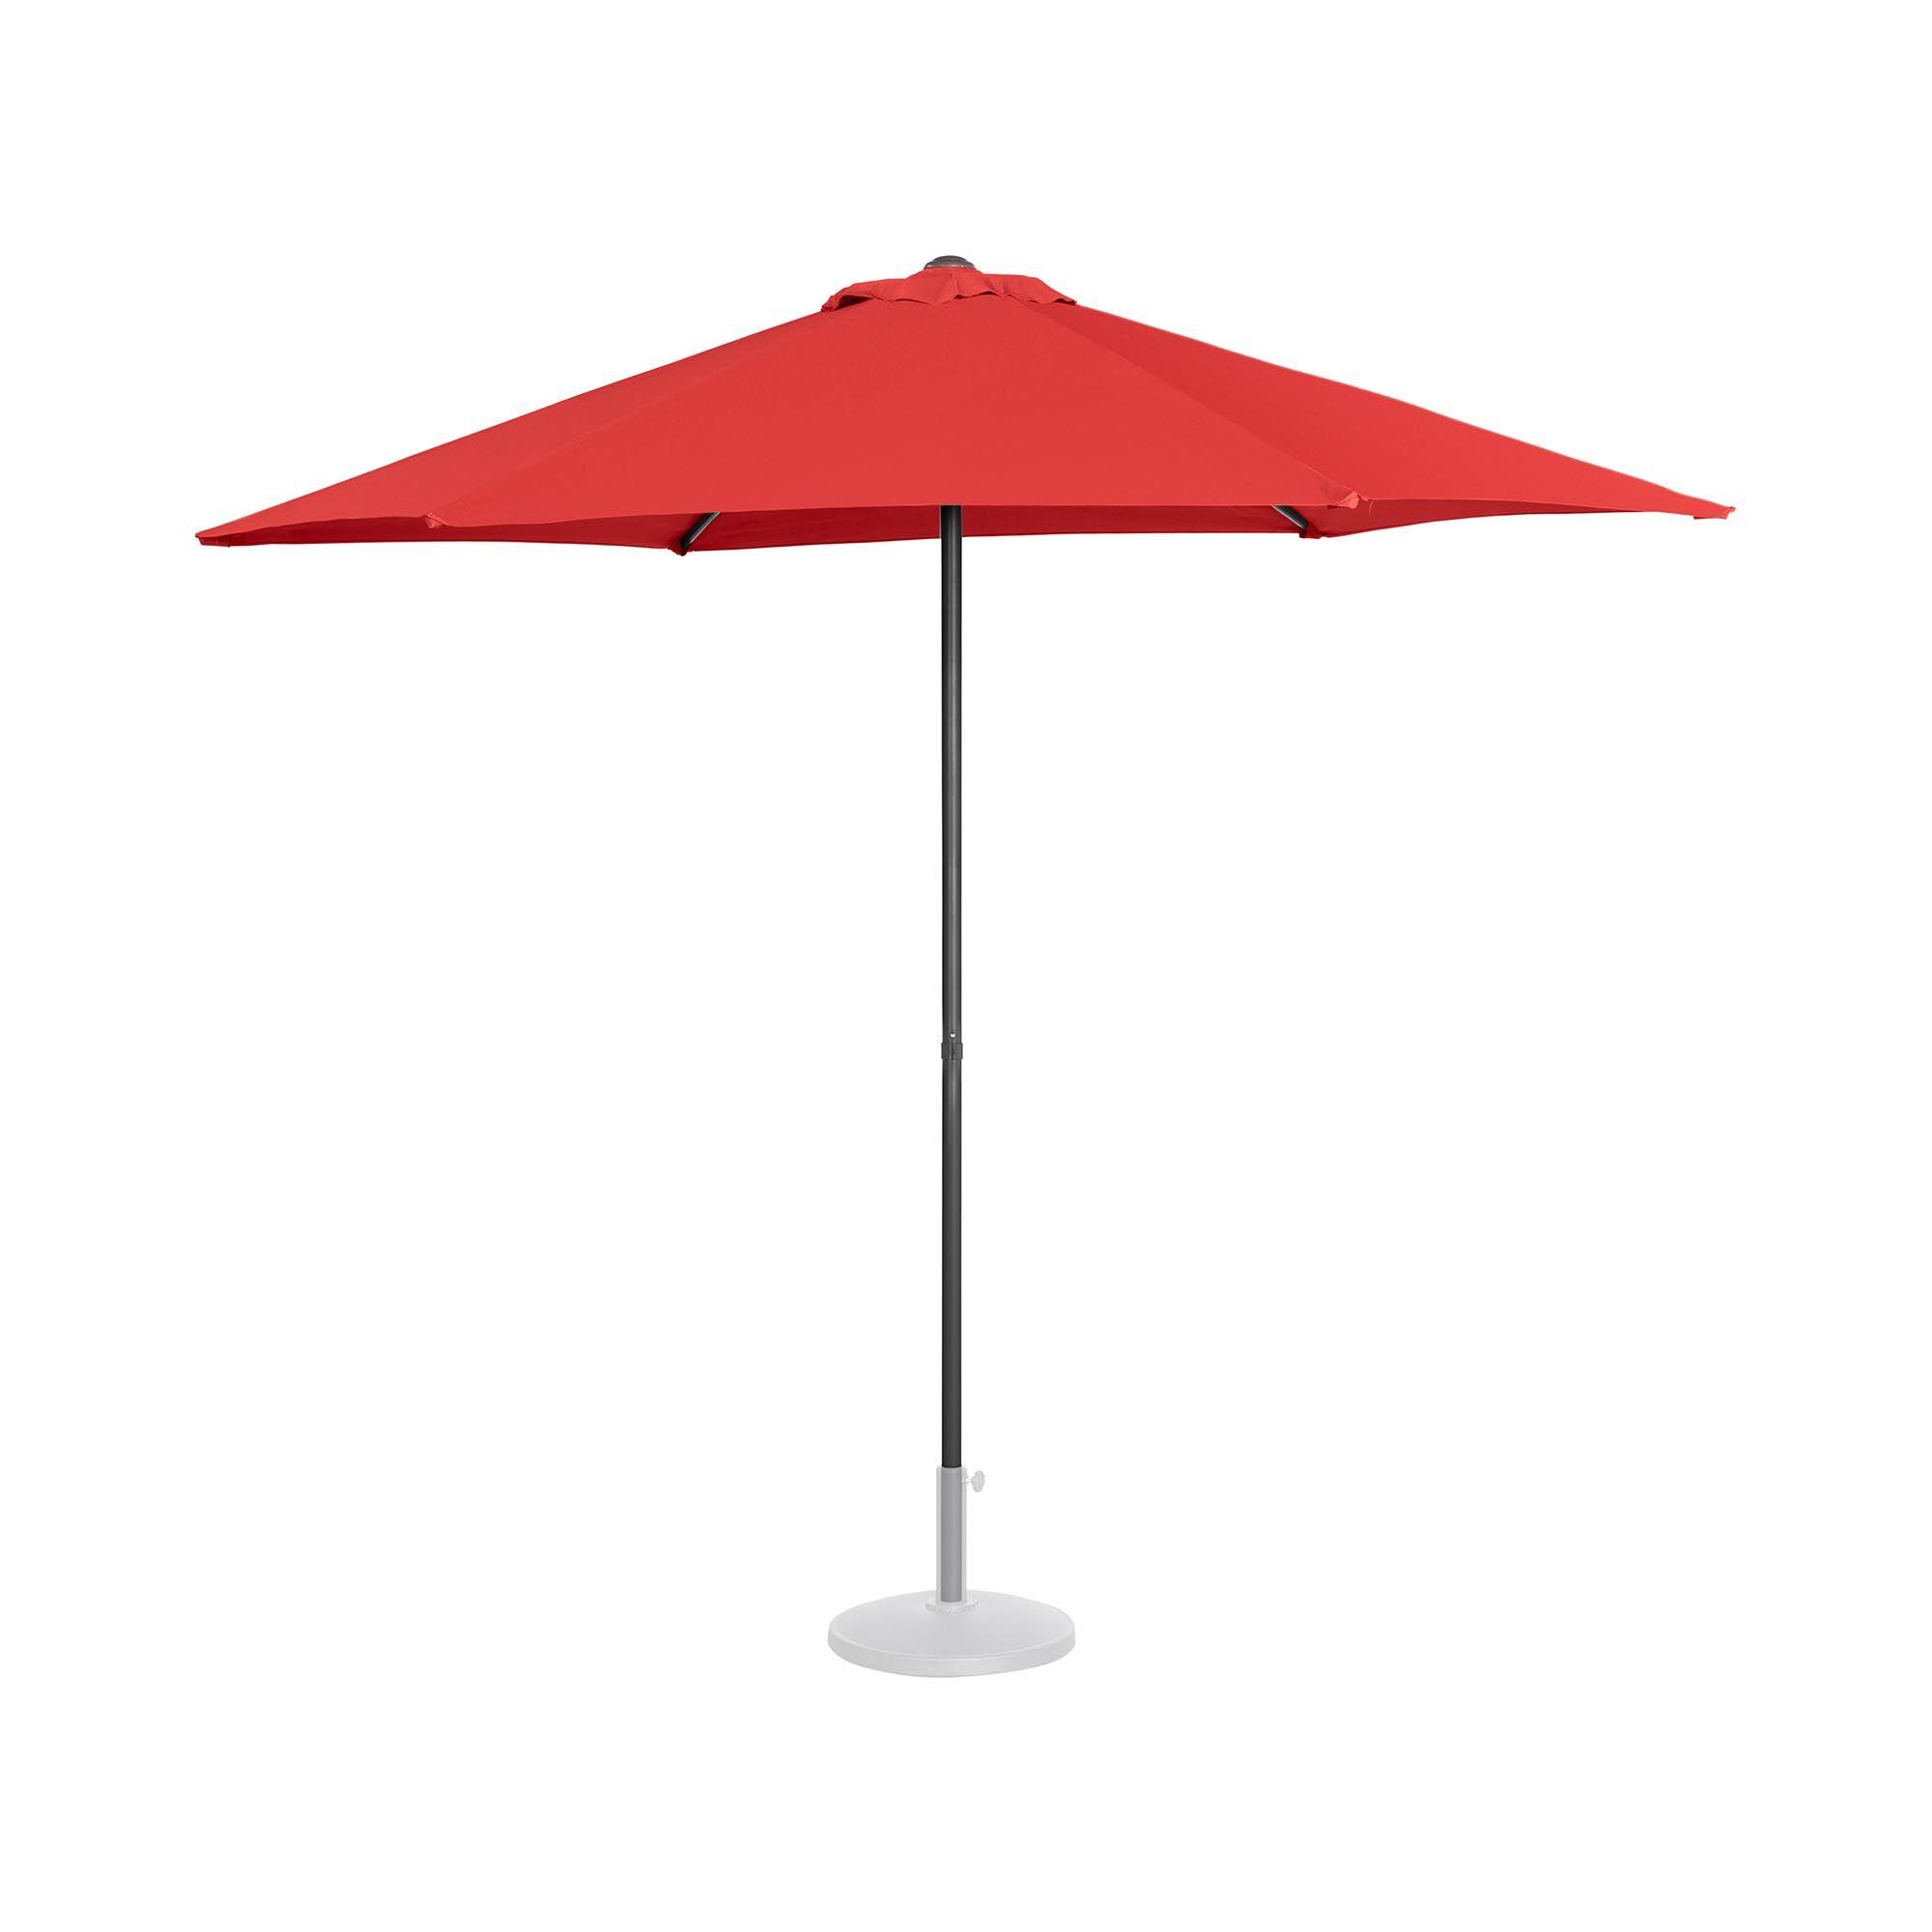 Uniprodo Parasol - rød - sekskantet - 270 cm i diameter UNI_UMBRELLA_MR270RE